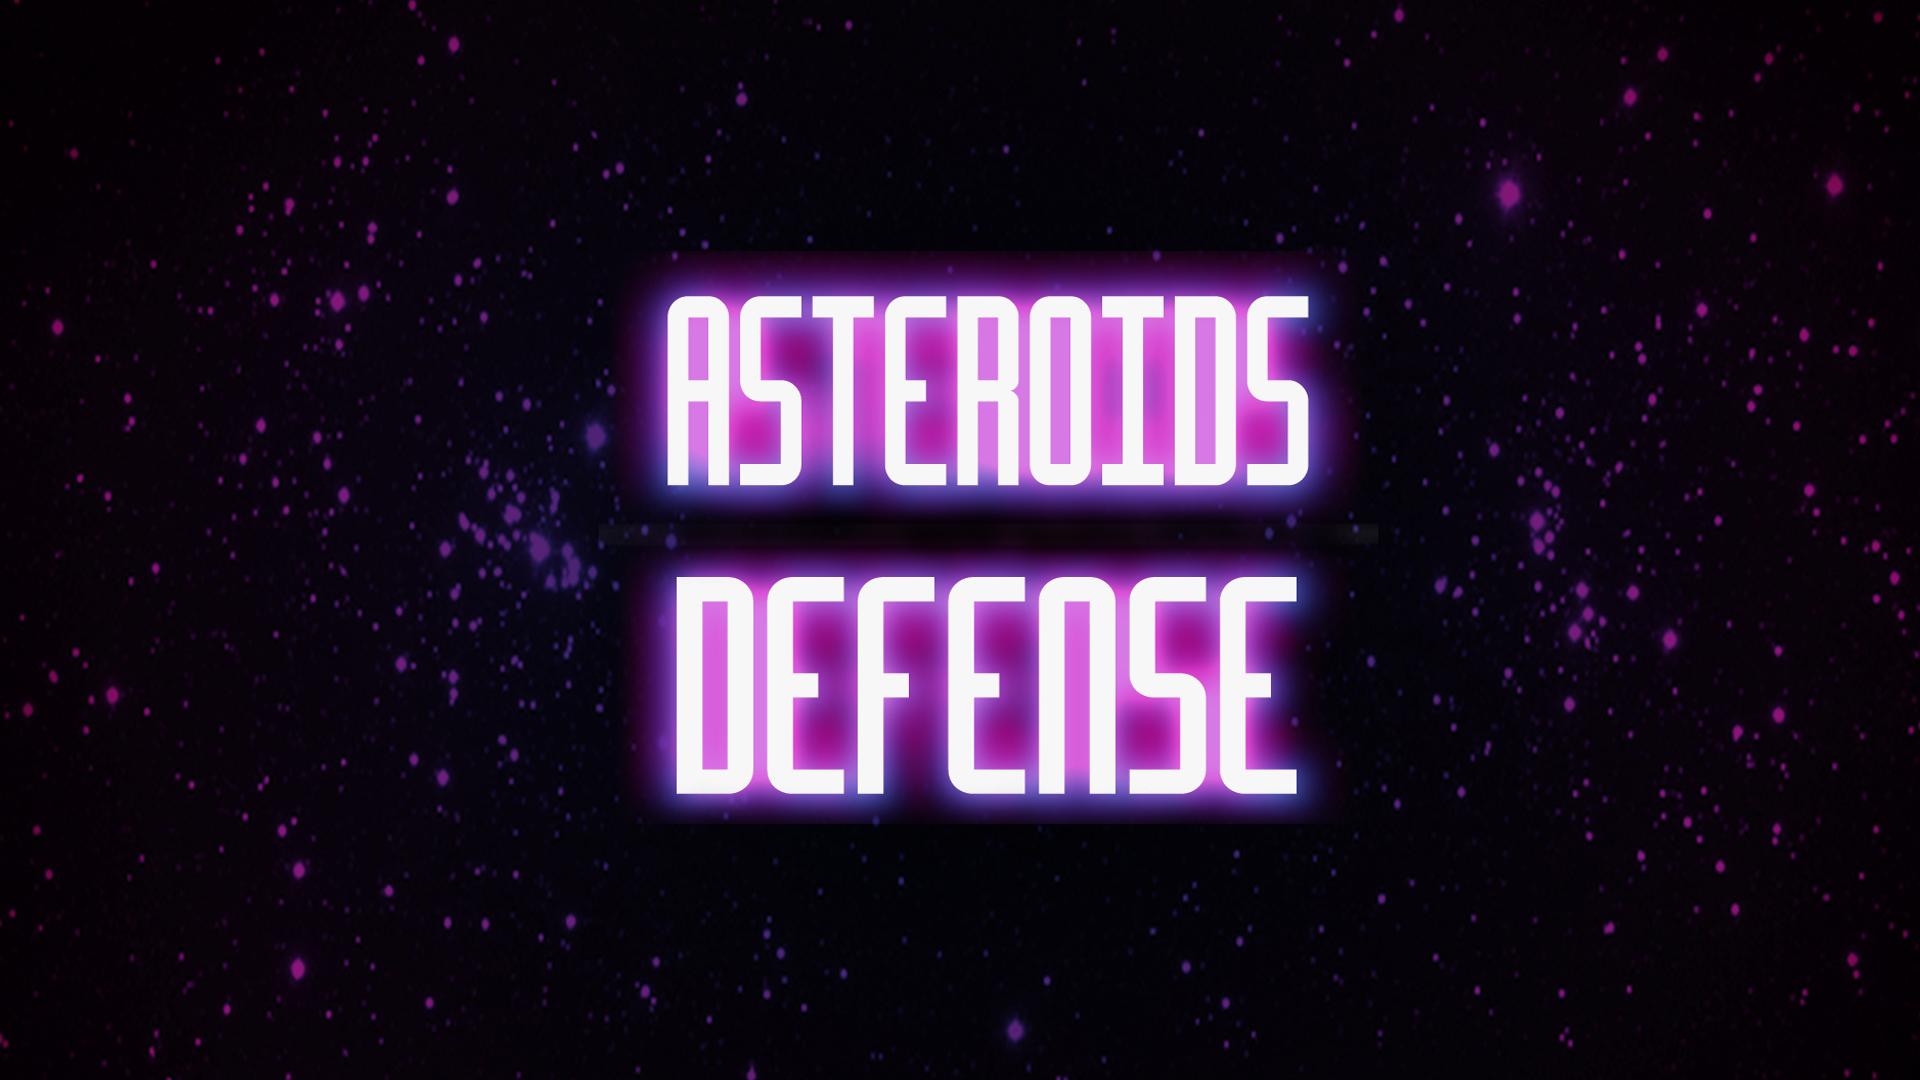 Asteroids Defense